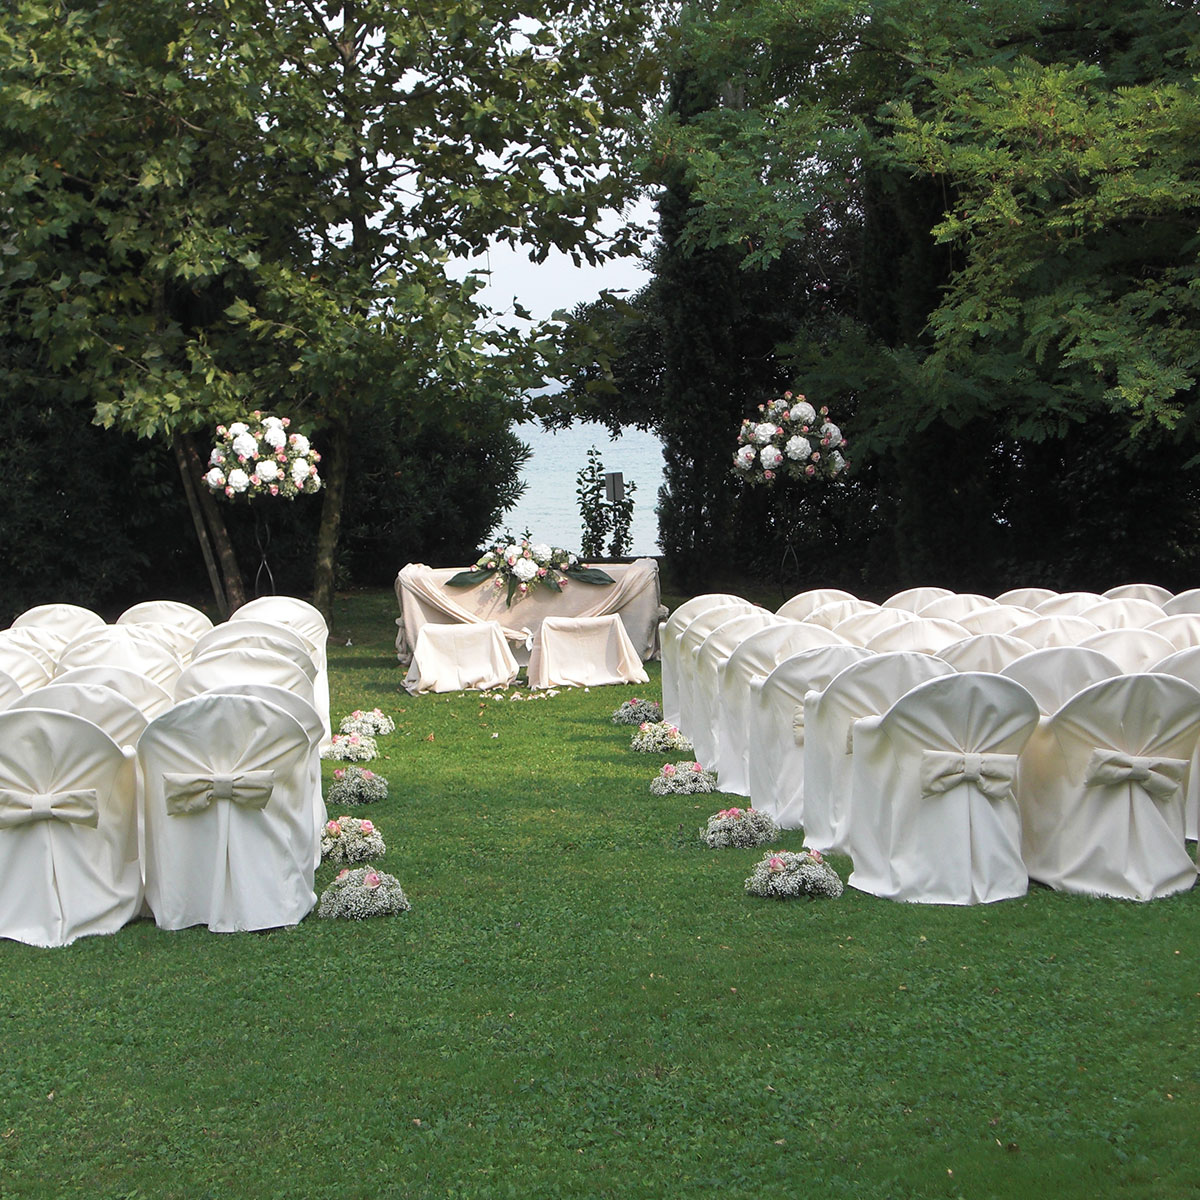 Matrimoni in giardino | Negriricevimenti.com